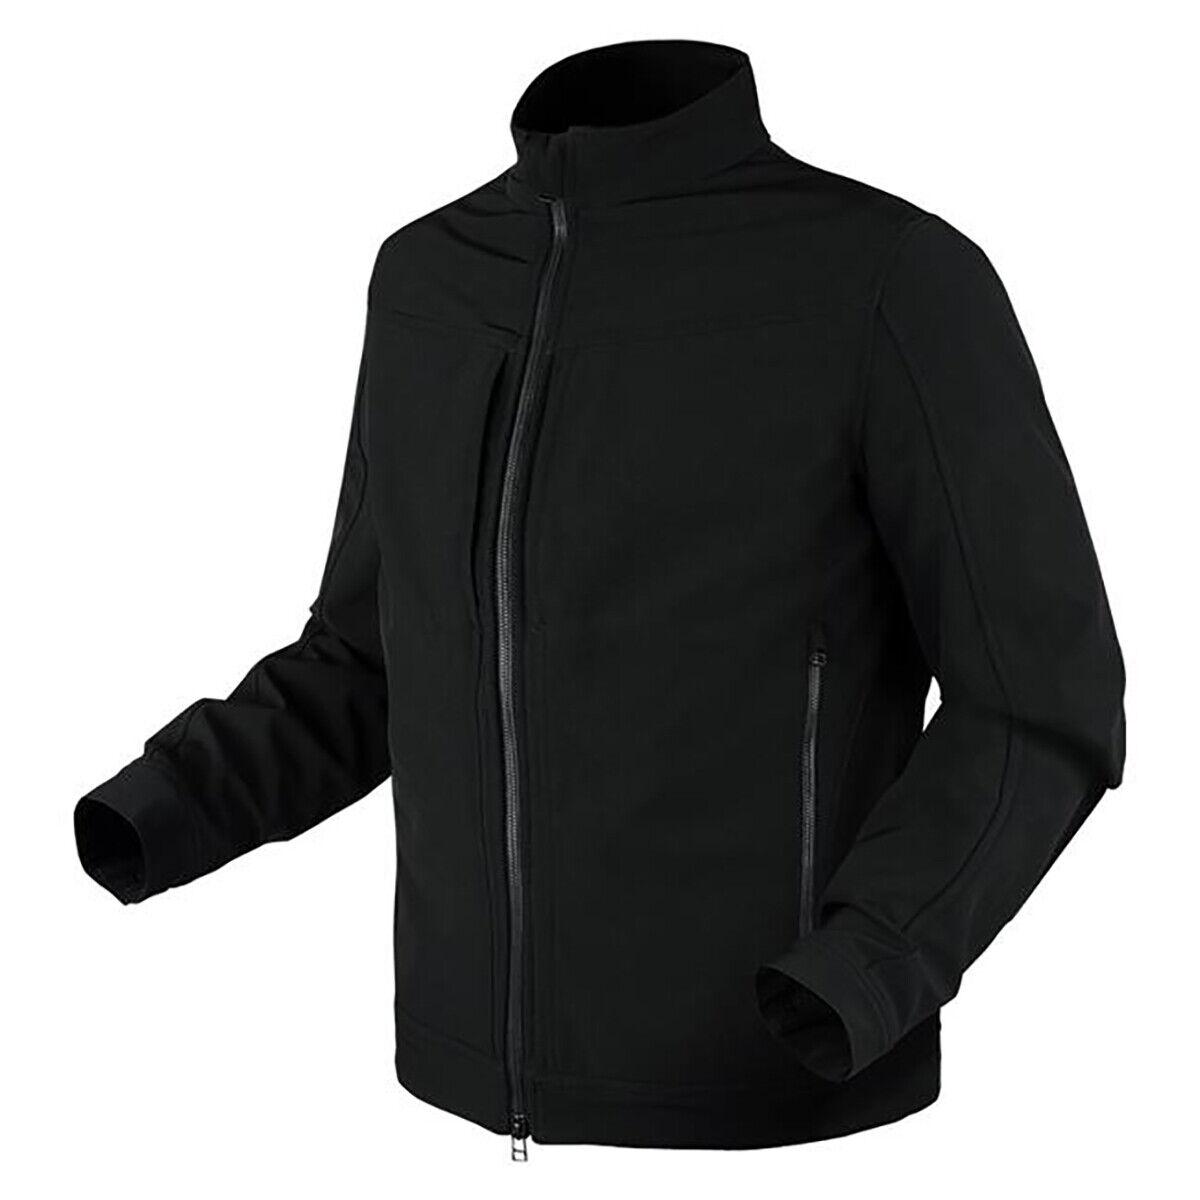 Condor Intrepid Softshell Jacket-Negro-XXL - 101133-002-XXL - Nuevo